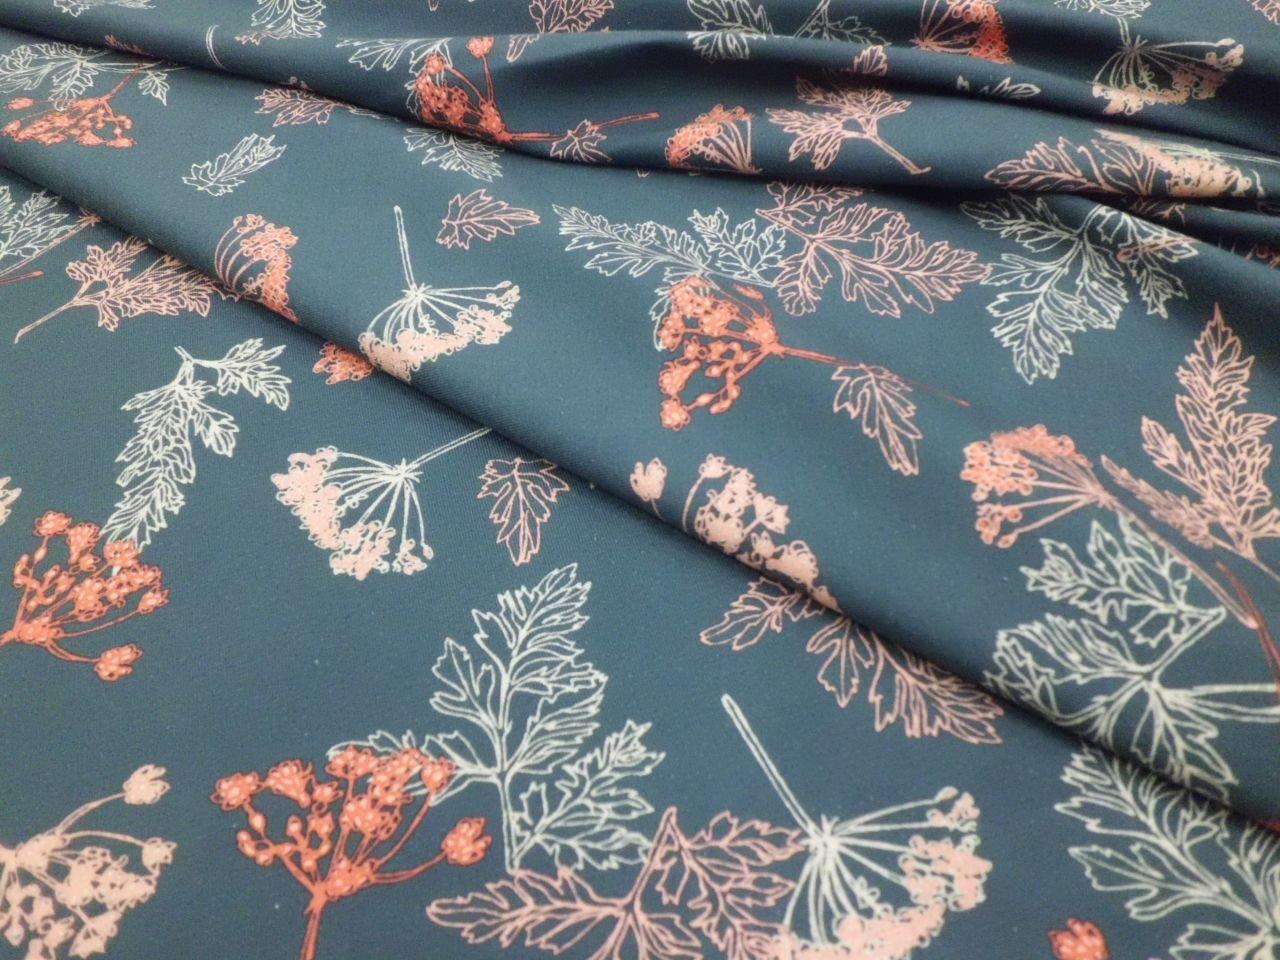 Stof Cotton & Elastane Jersey Knit Floral Print